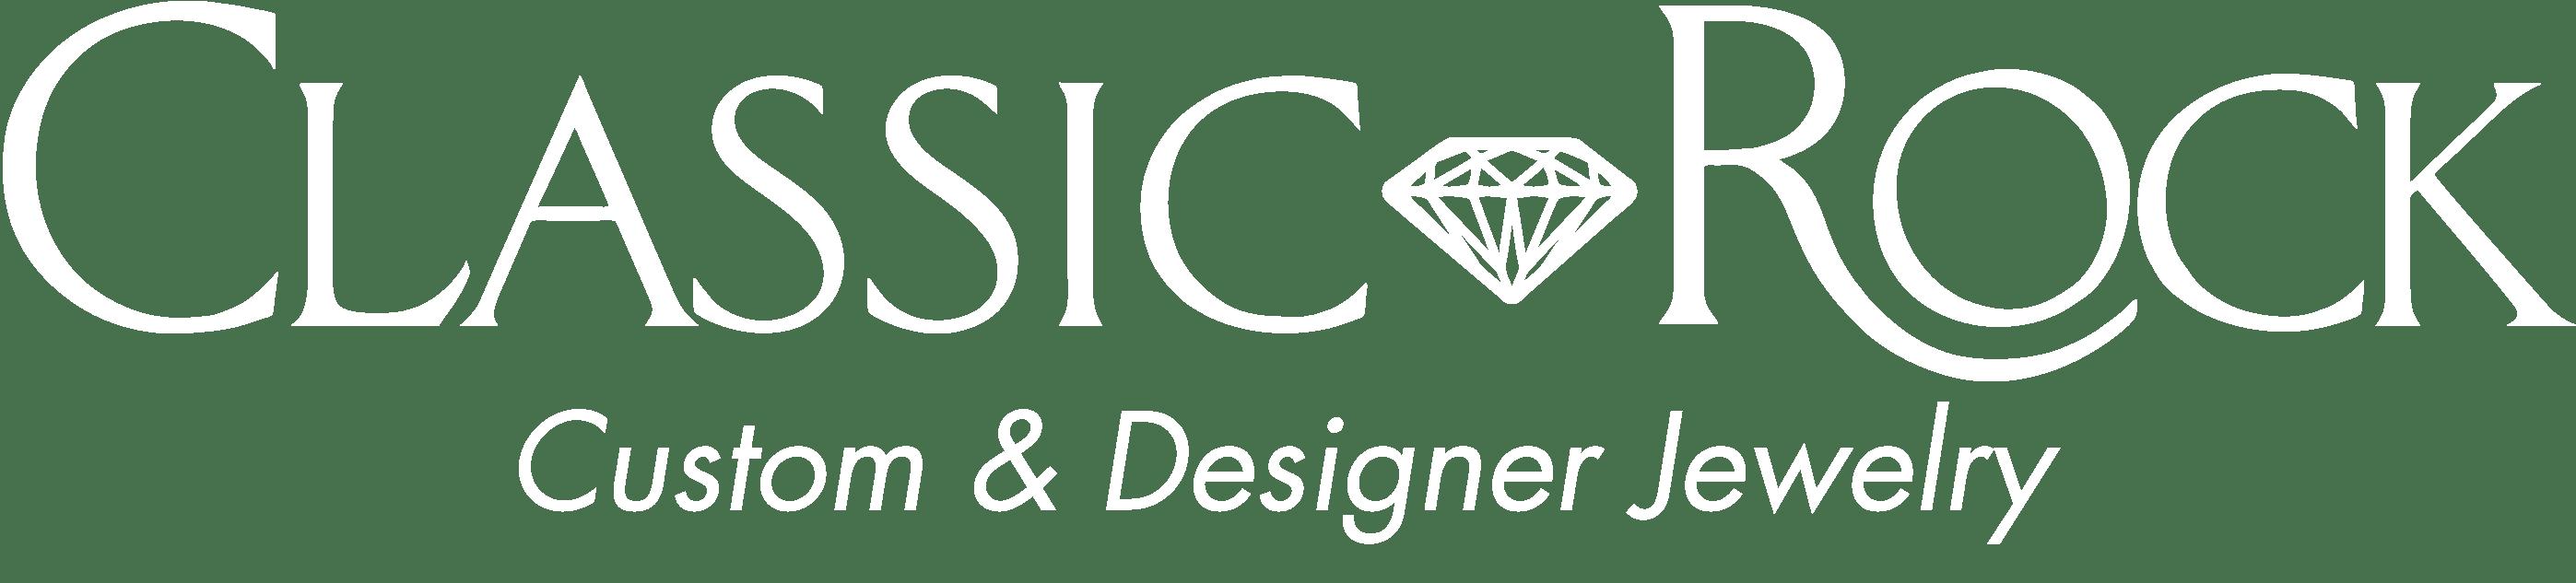 Classic Rock Custom and Designer Jewelry